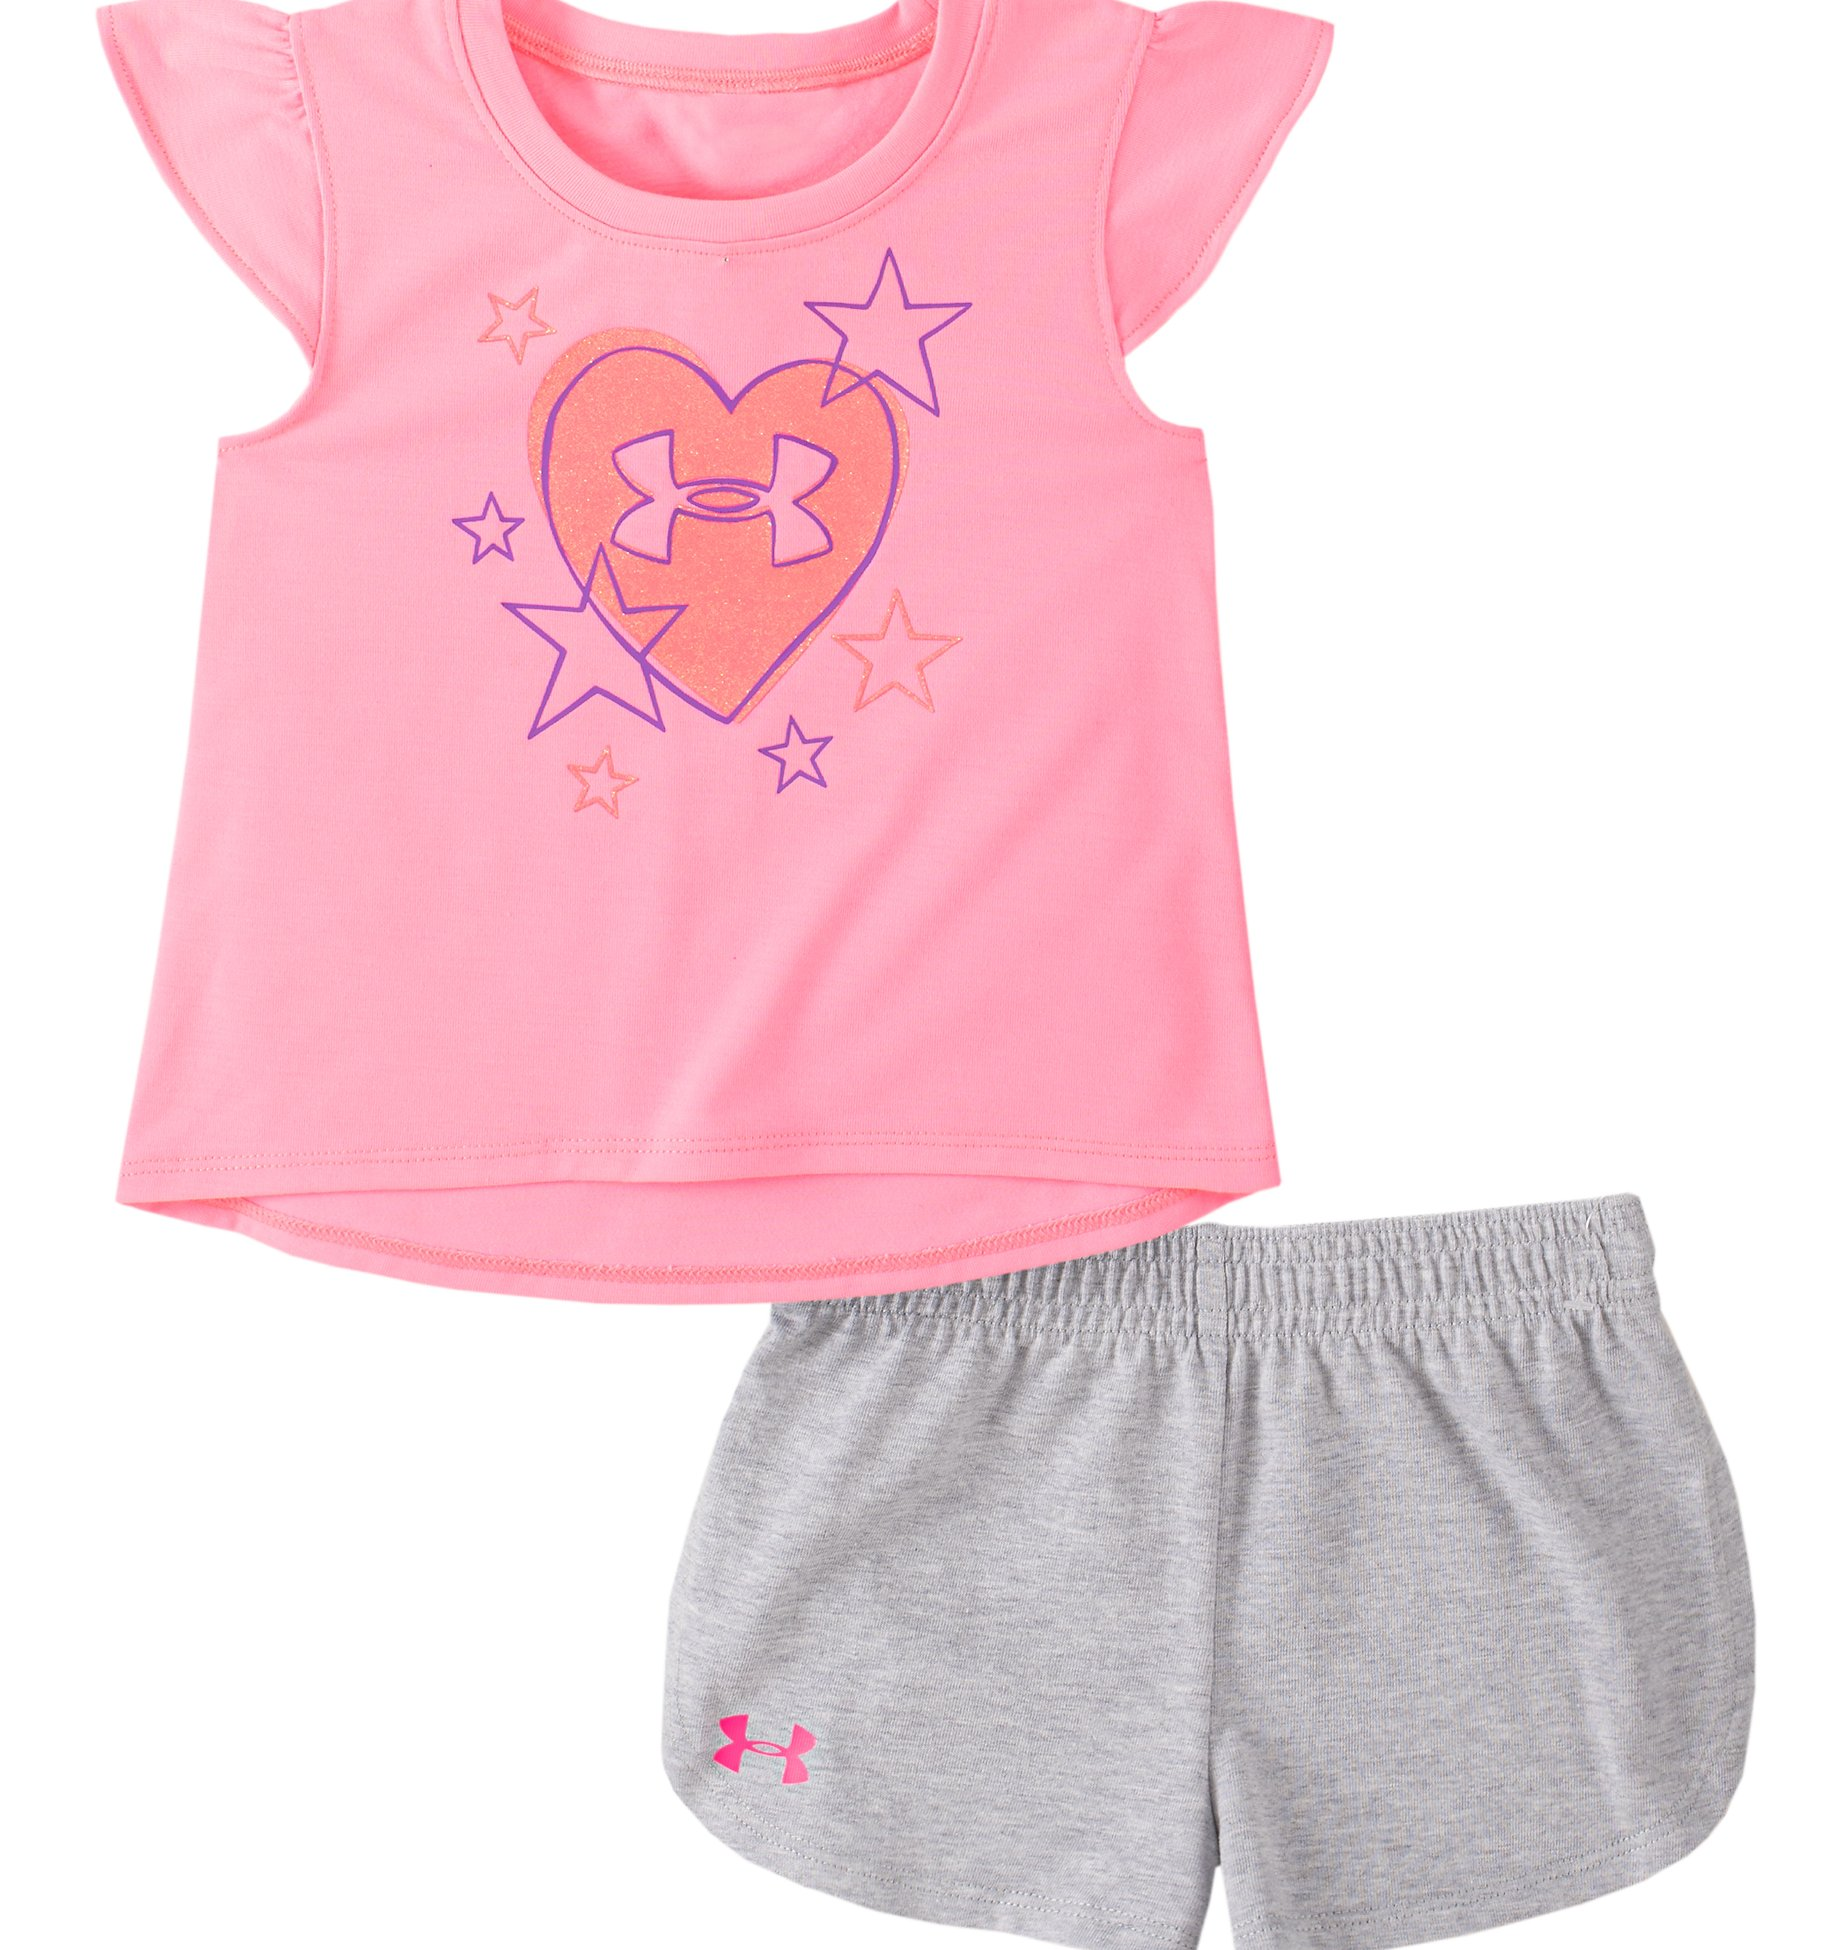 Underarmour Girls Toddler UA Star Crossed Set